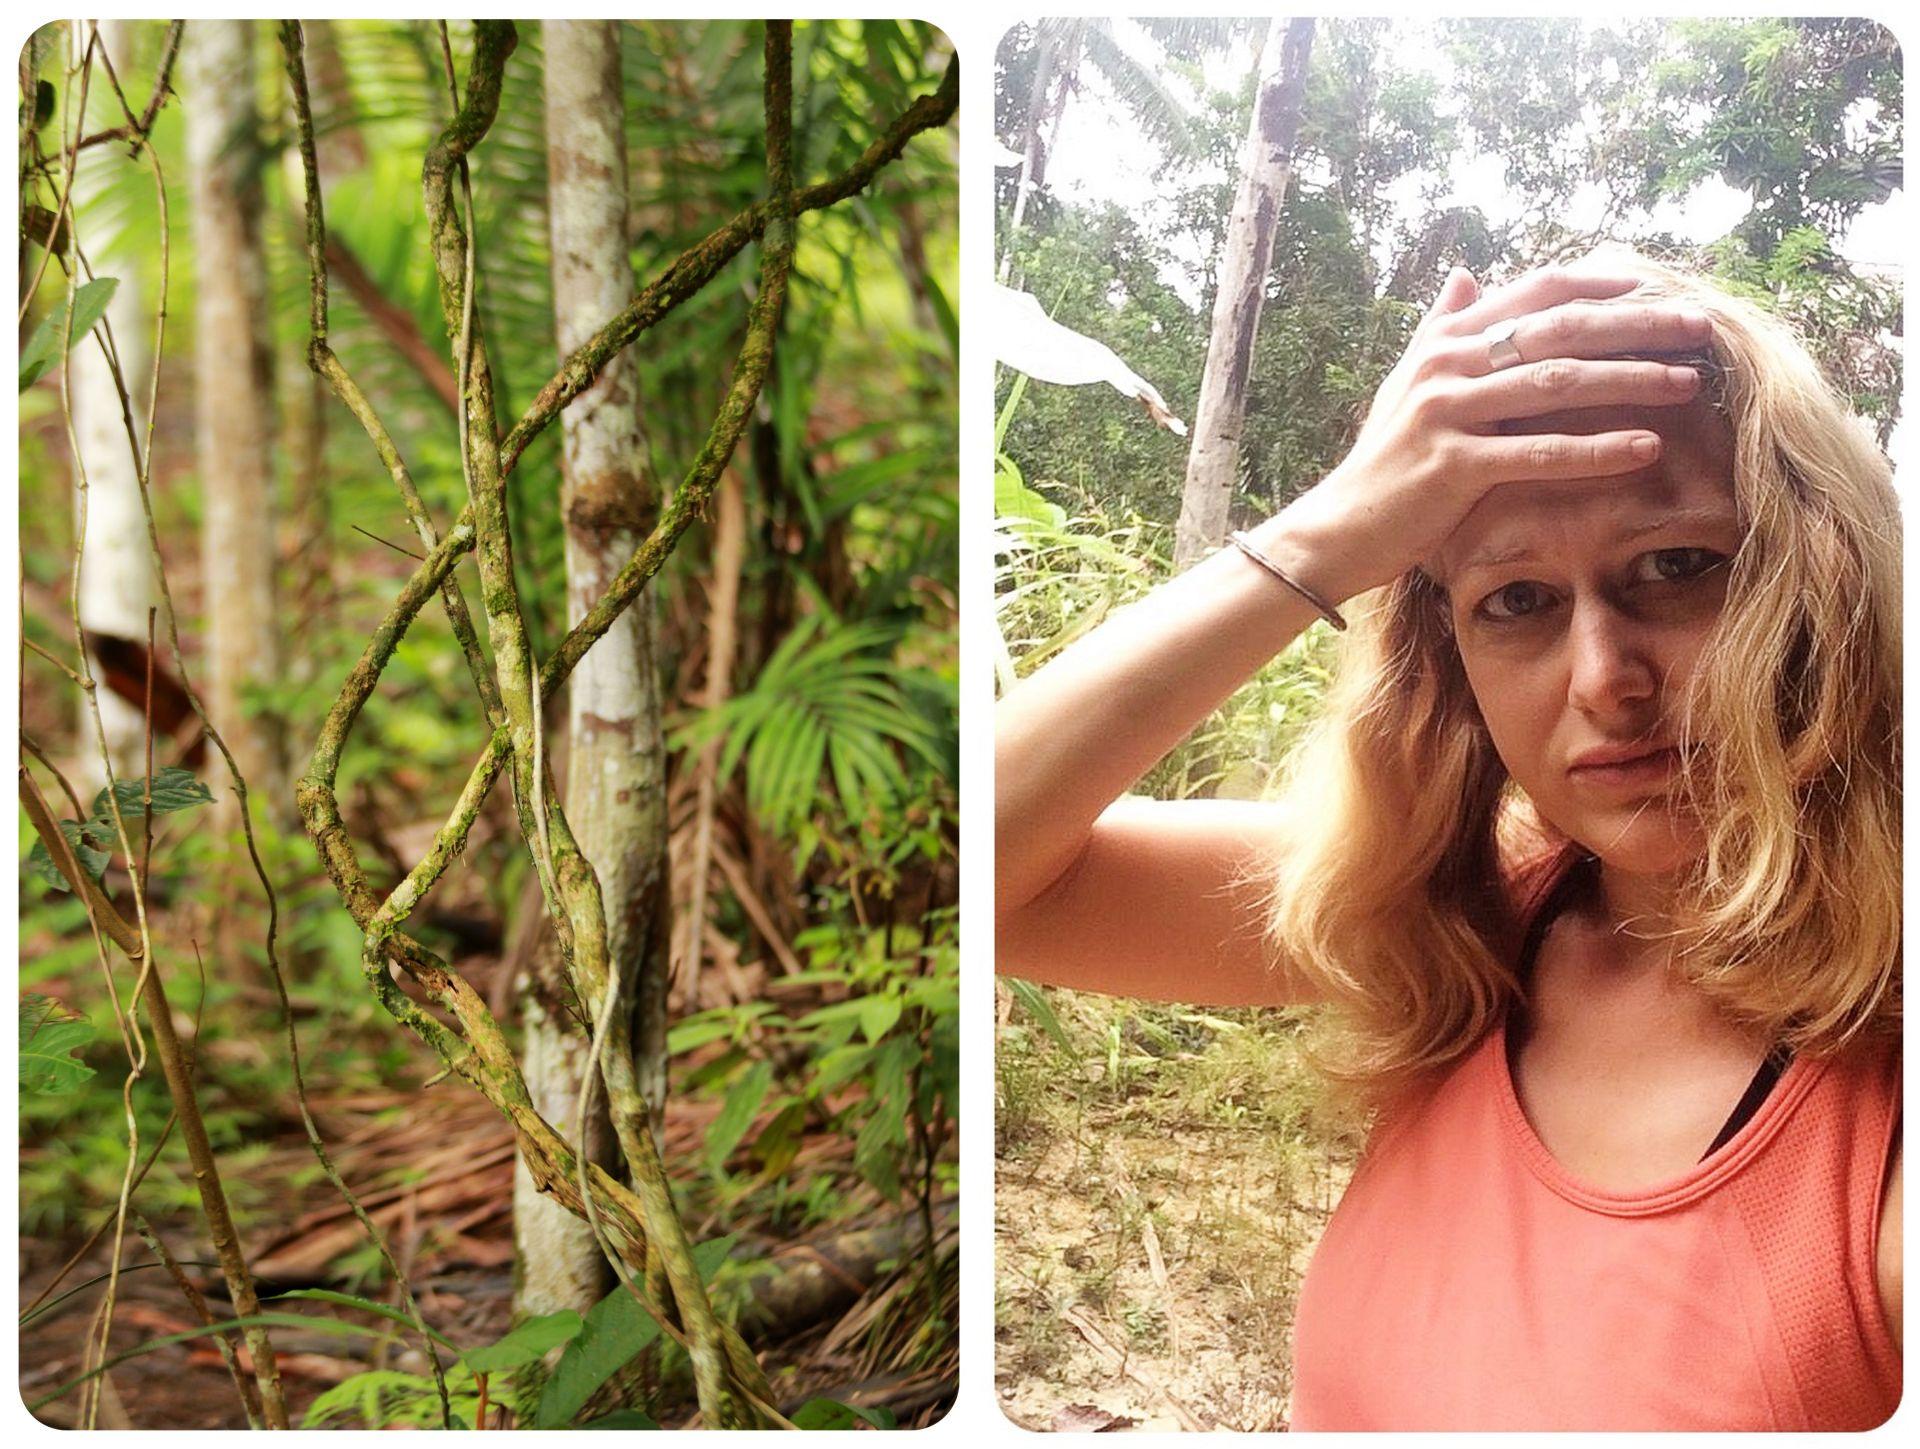 Ayahuasca Plant & Dani